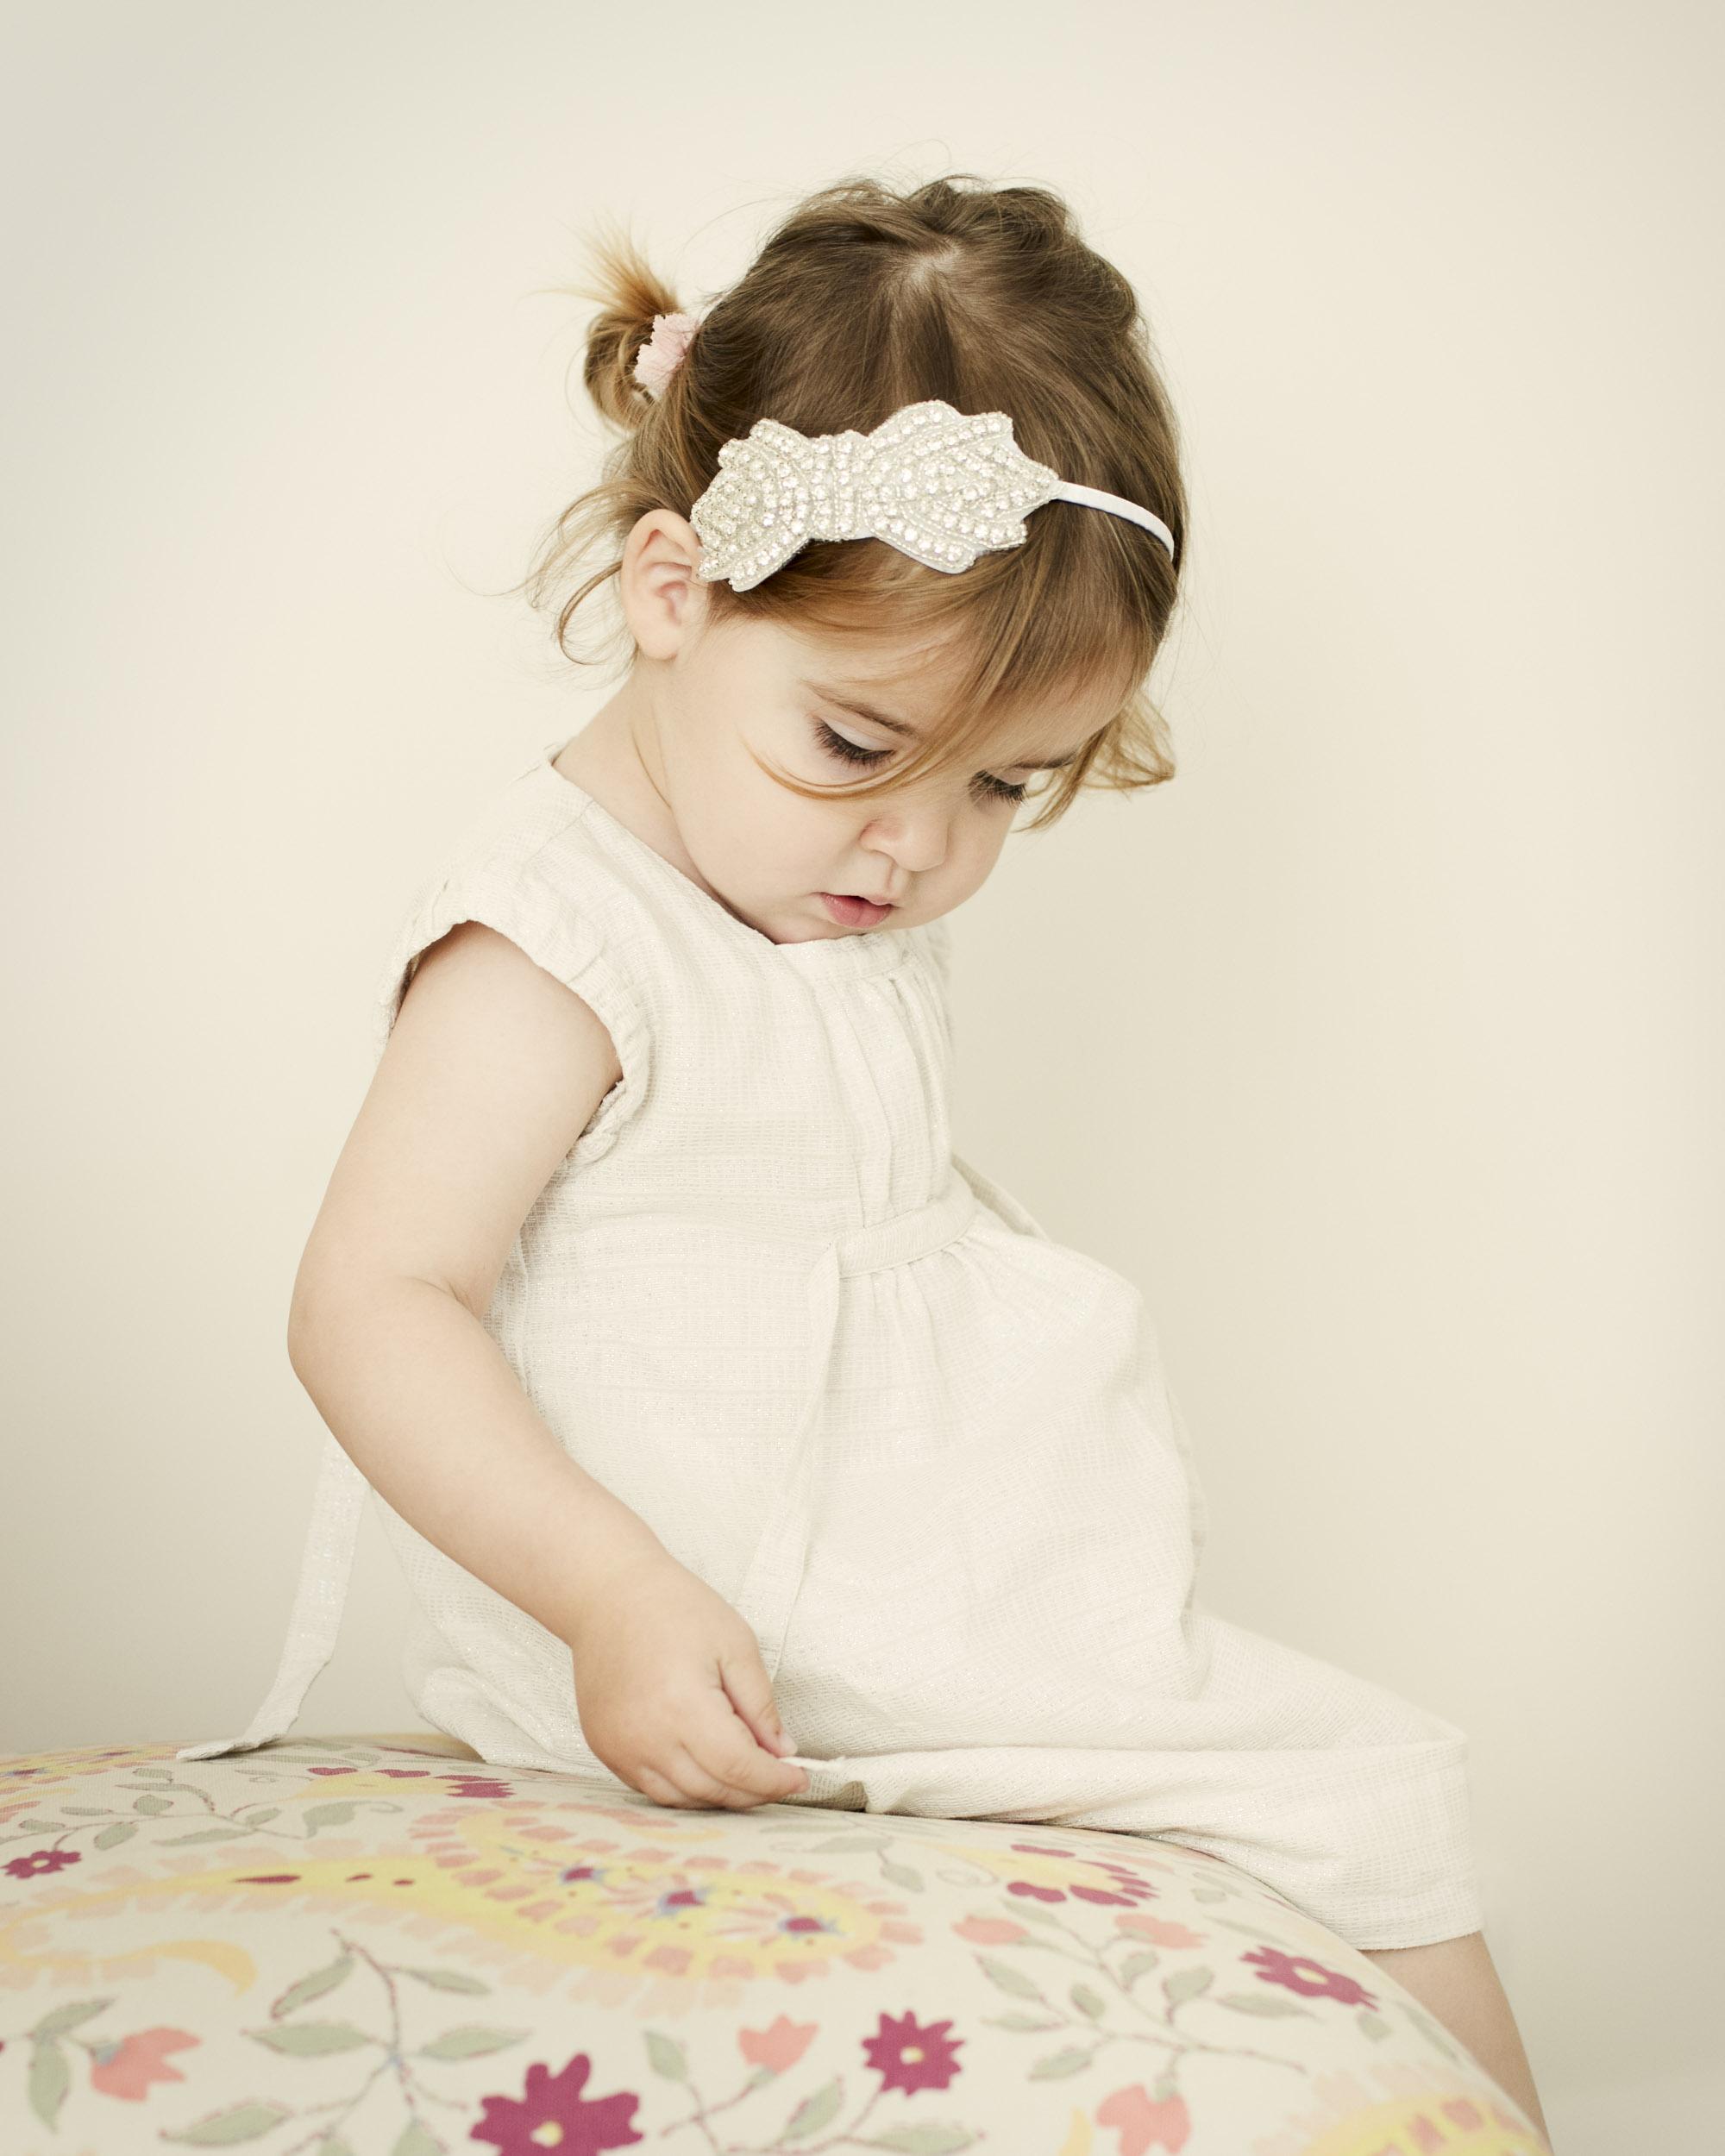 marina-mcdonald-child-portrait-photography-portfolio-canberra-child-on-chair